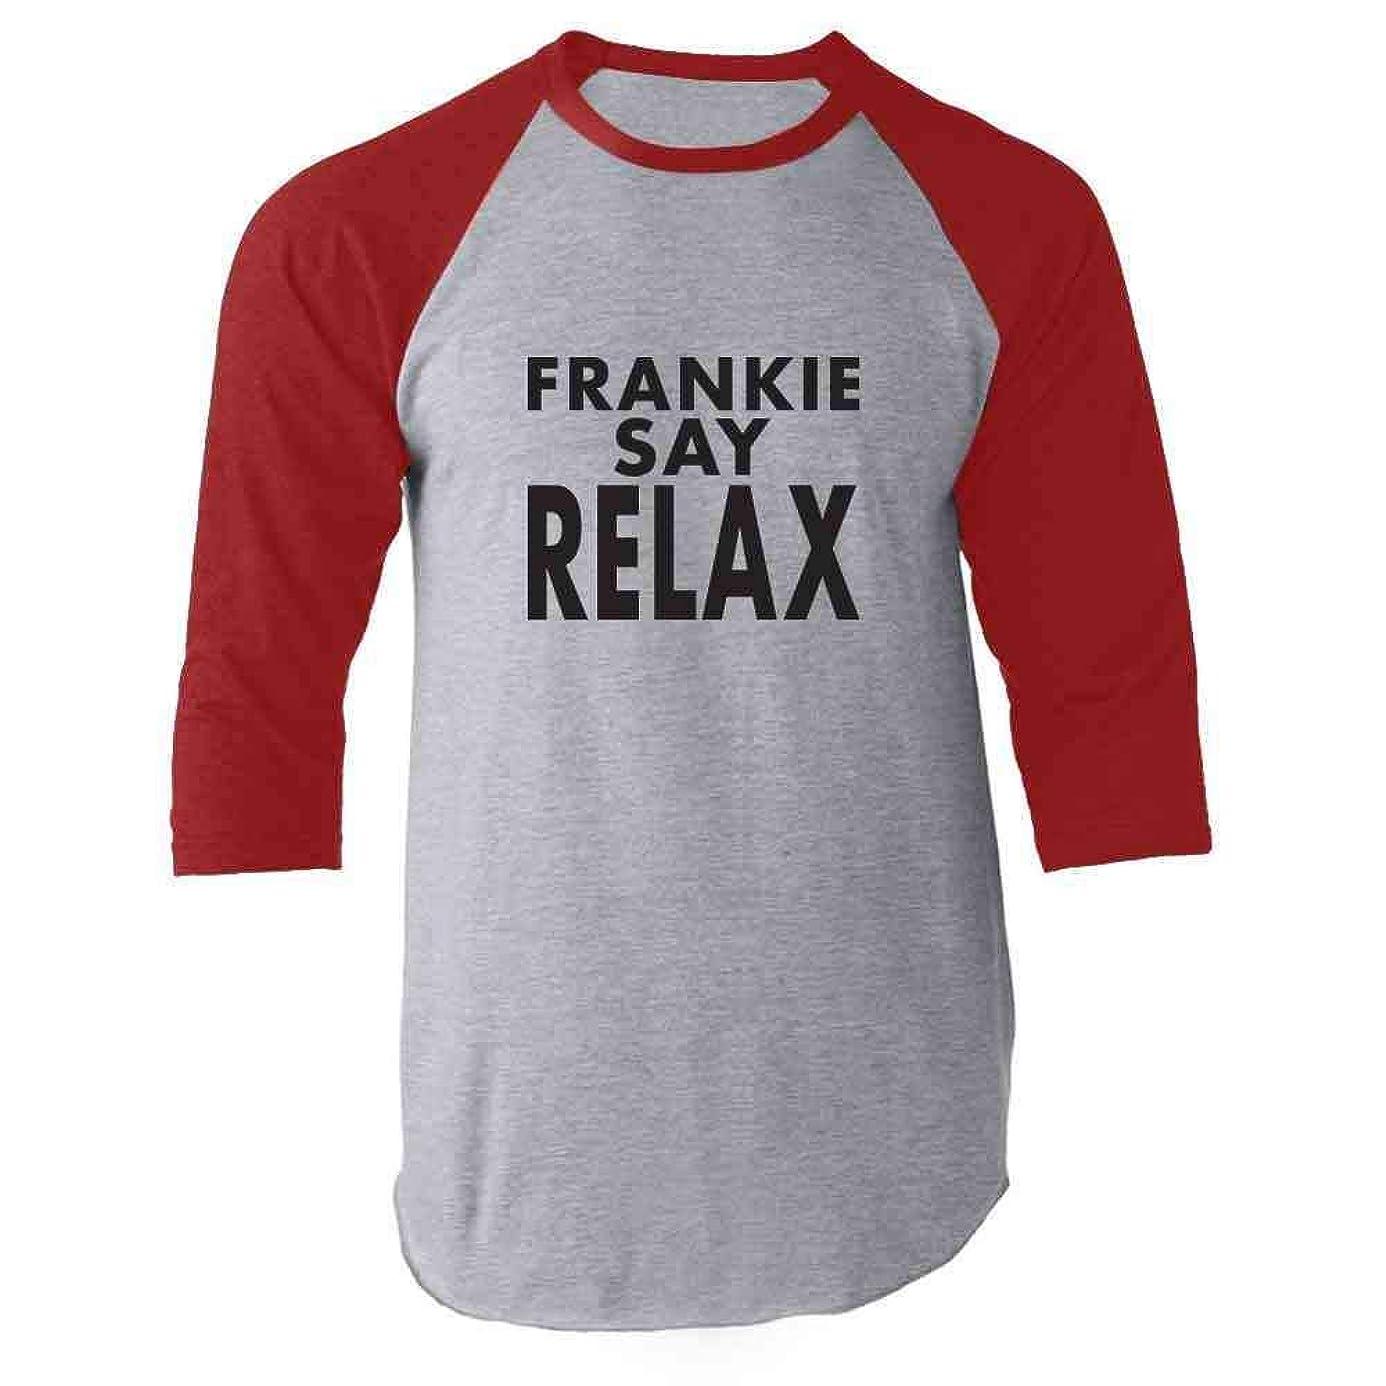 Frankie Say Relax Classic 80s Raglan Baseball Tee Shirt